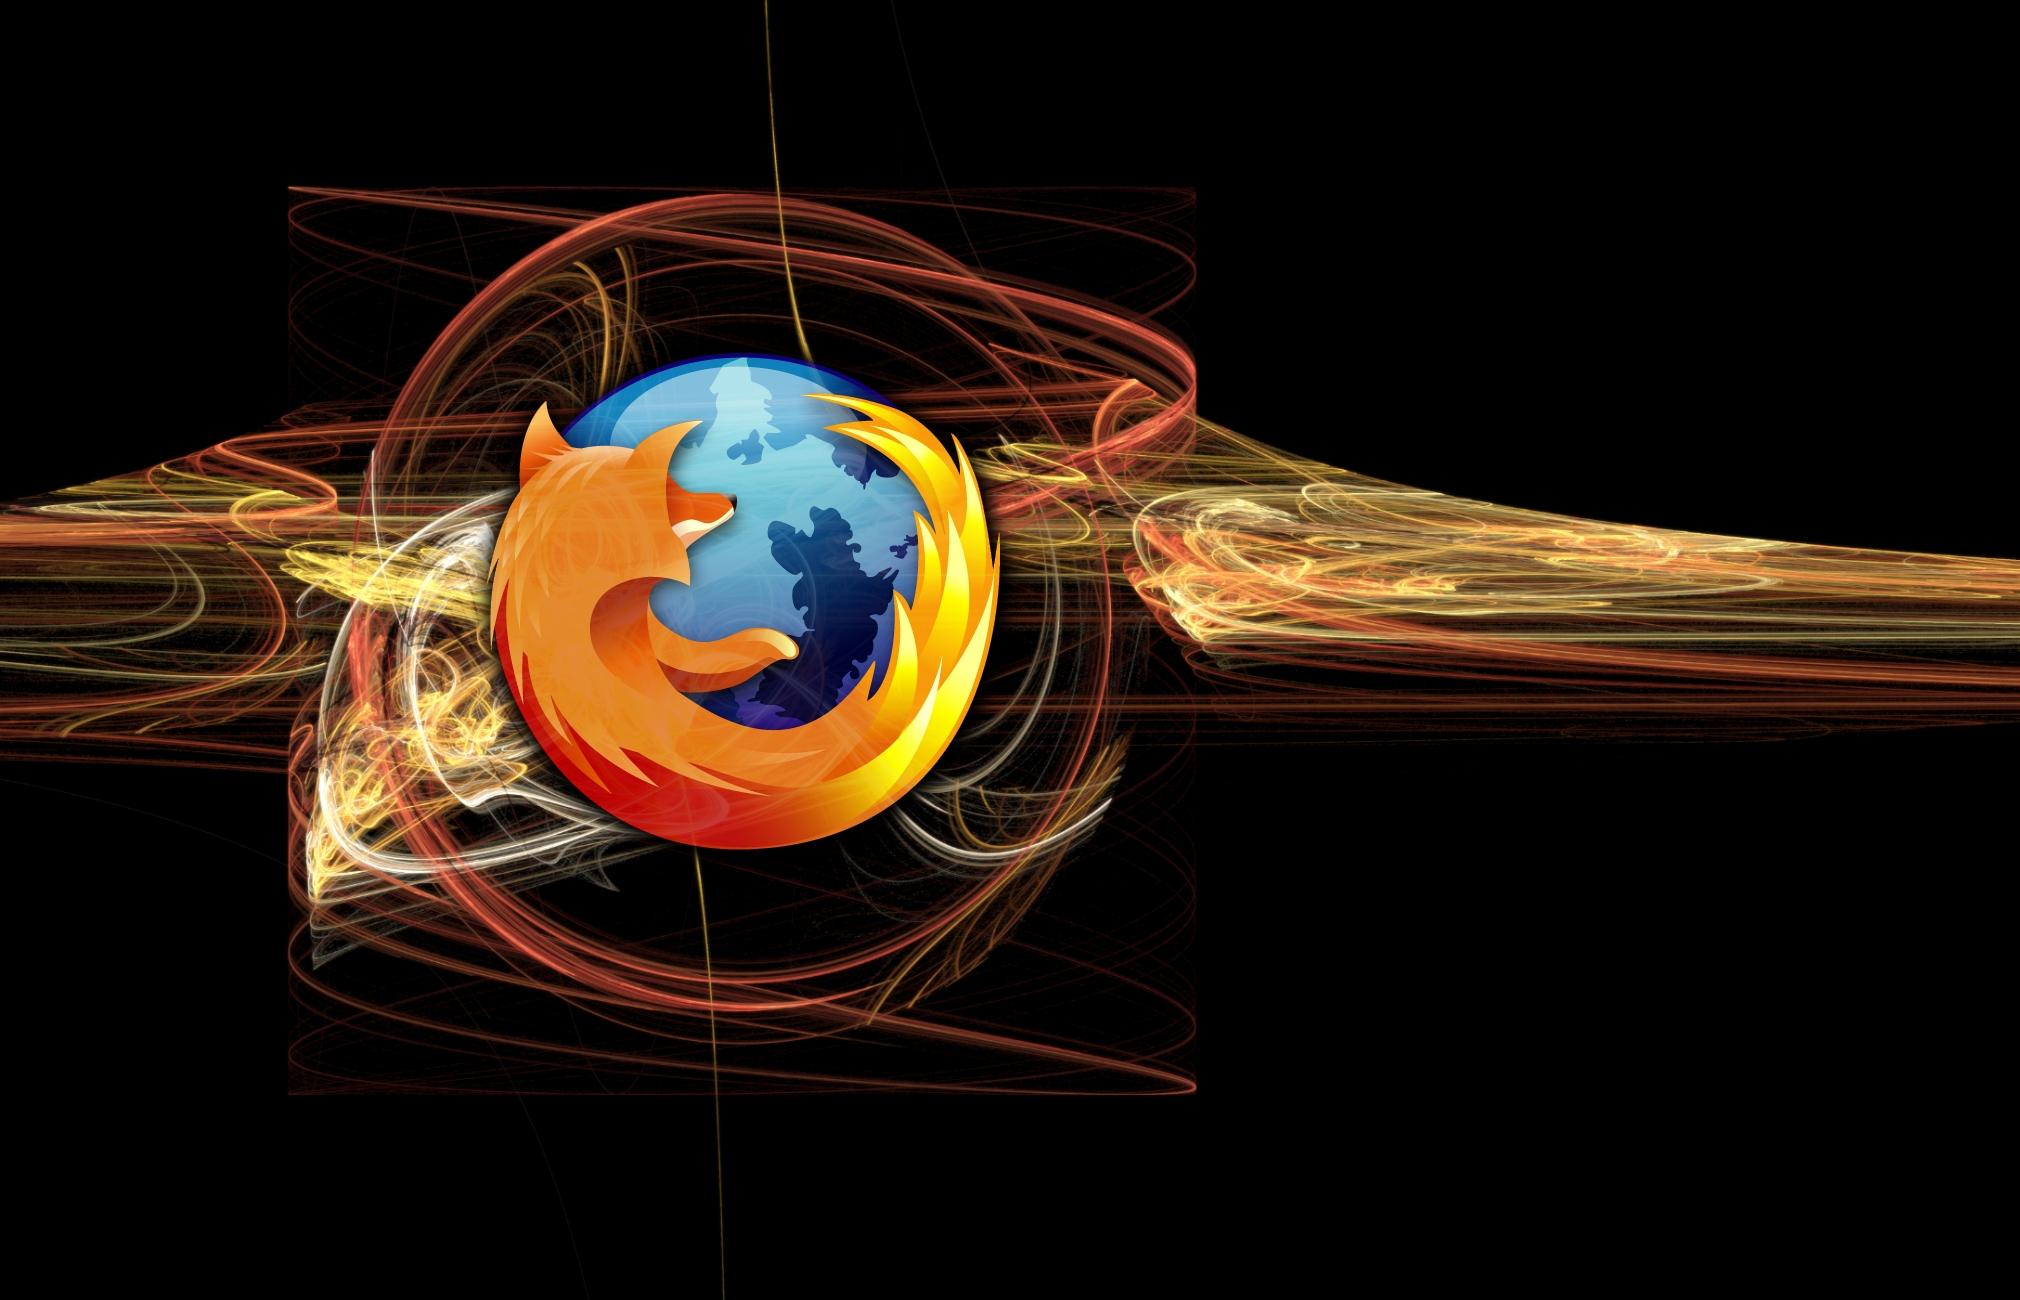 Mozilla-Firefox-Abstract-Design McAfee Blogs